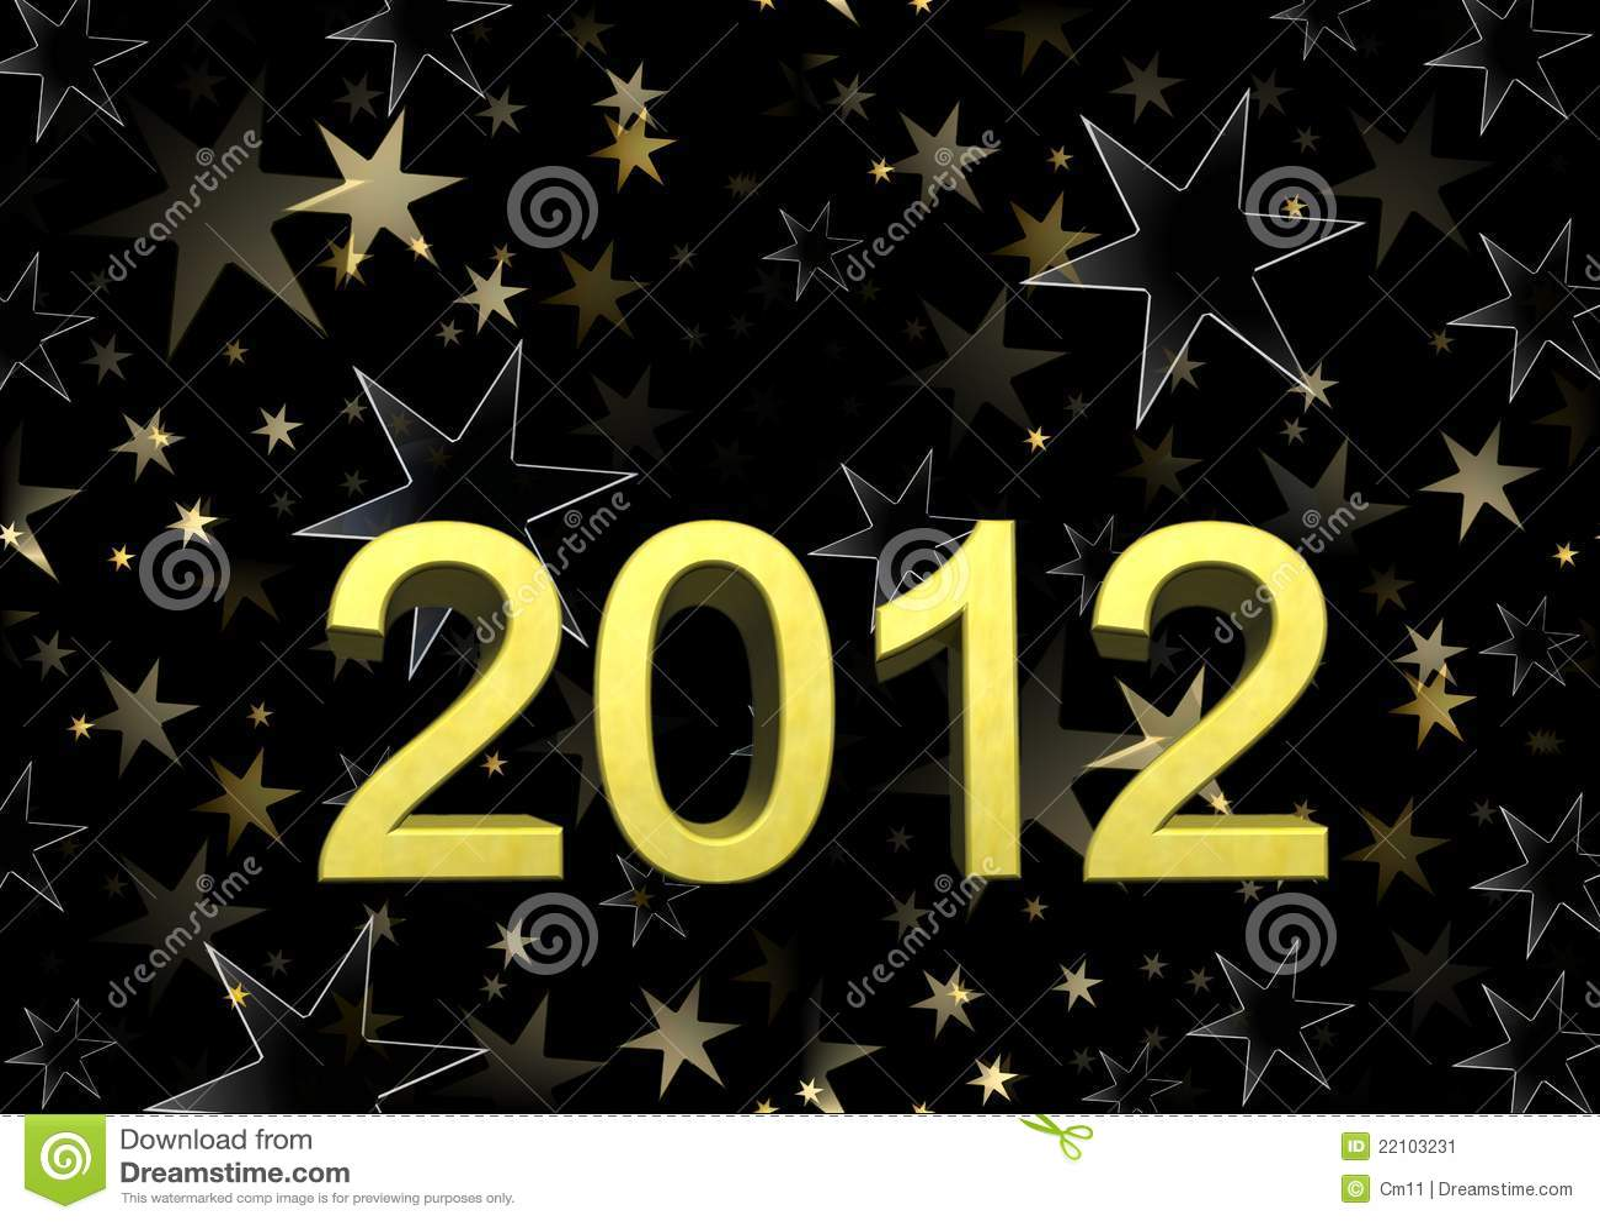 Nous te souhaitons un an neuf heureux 2012